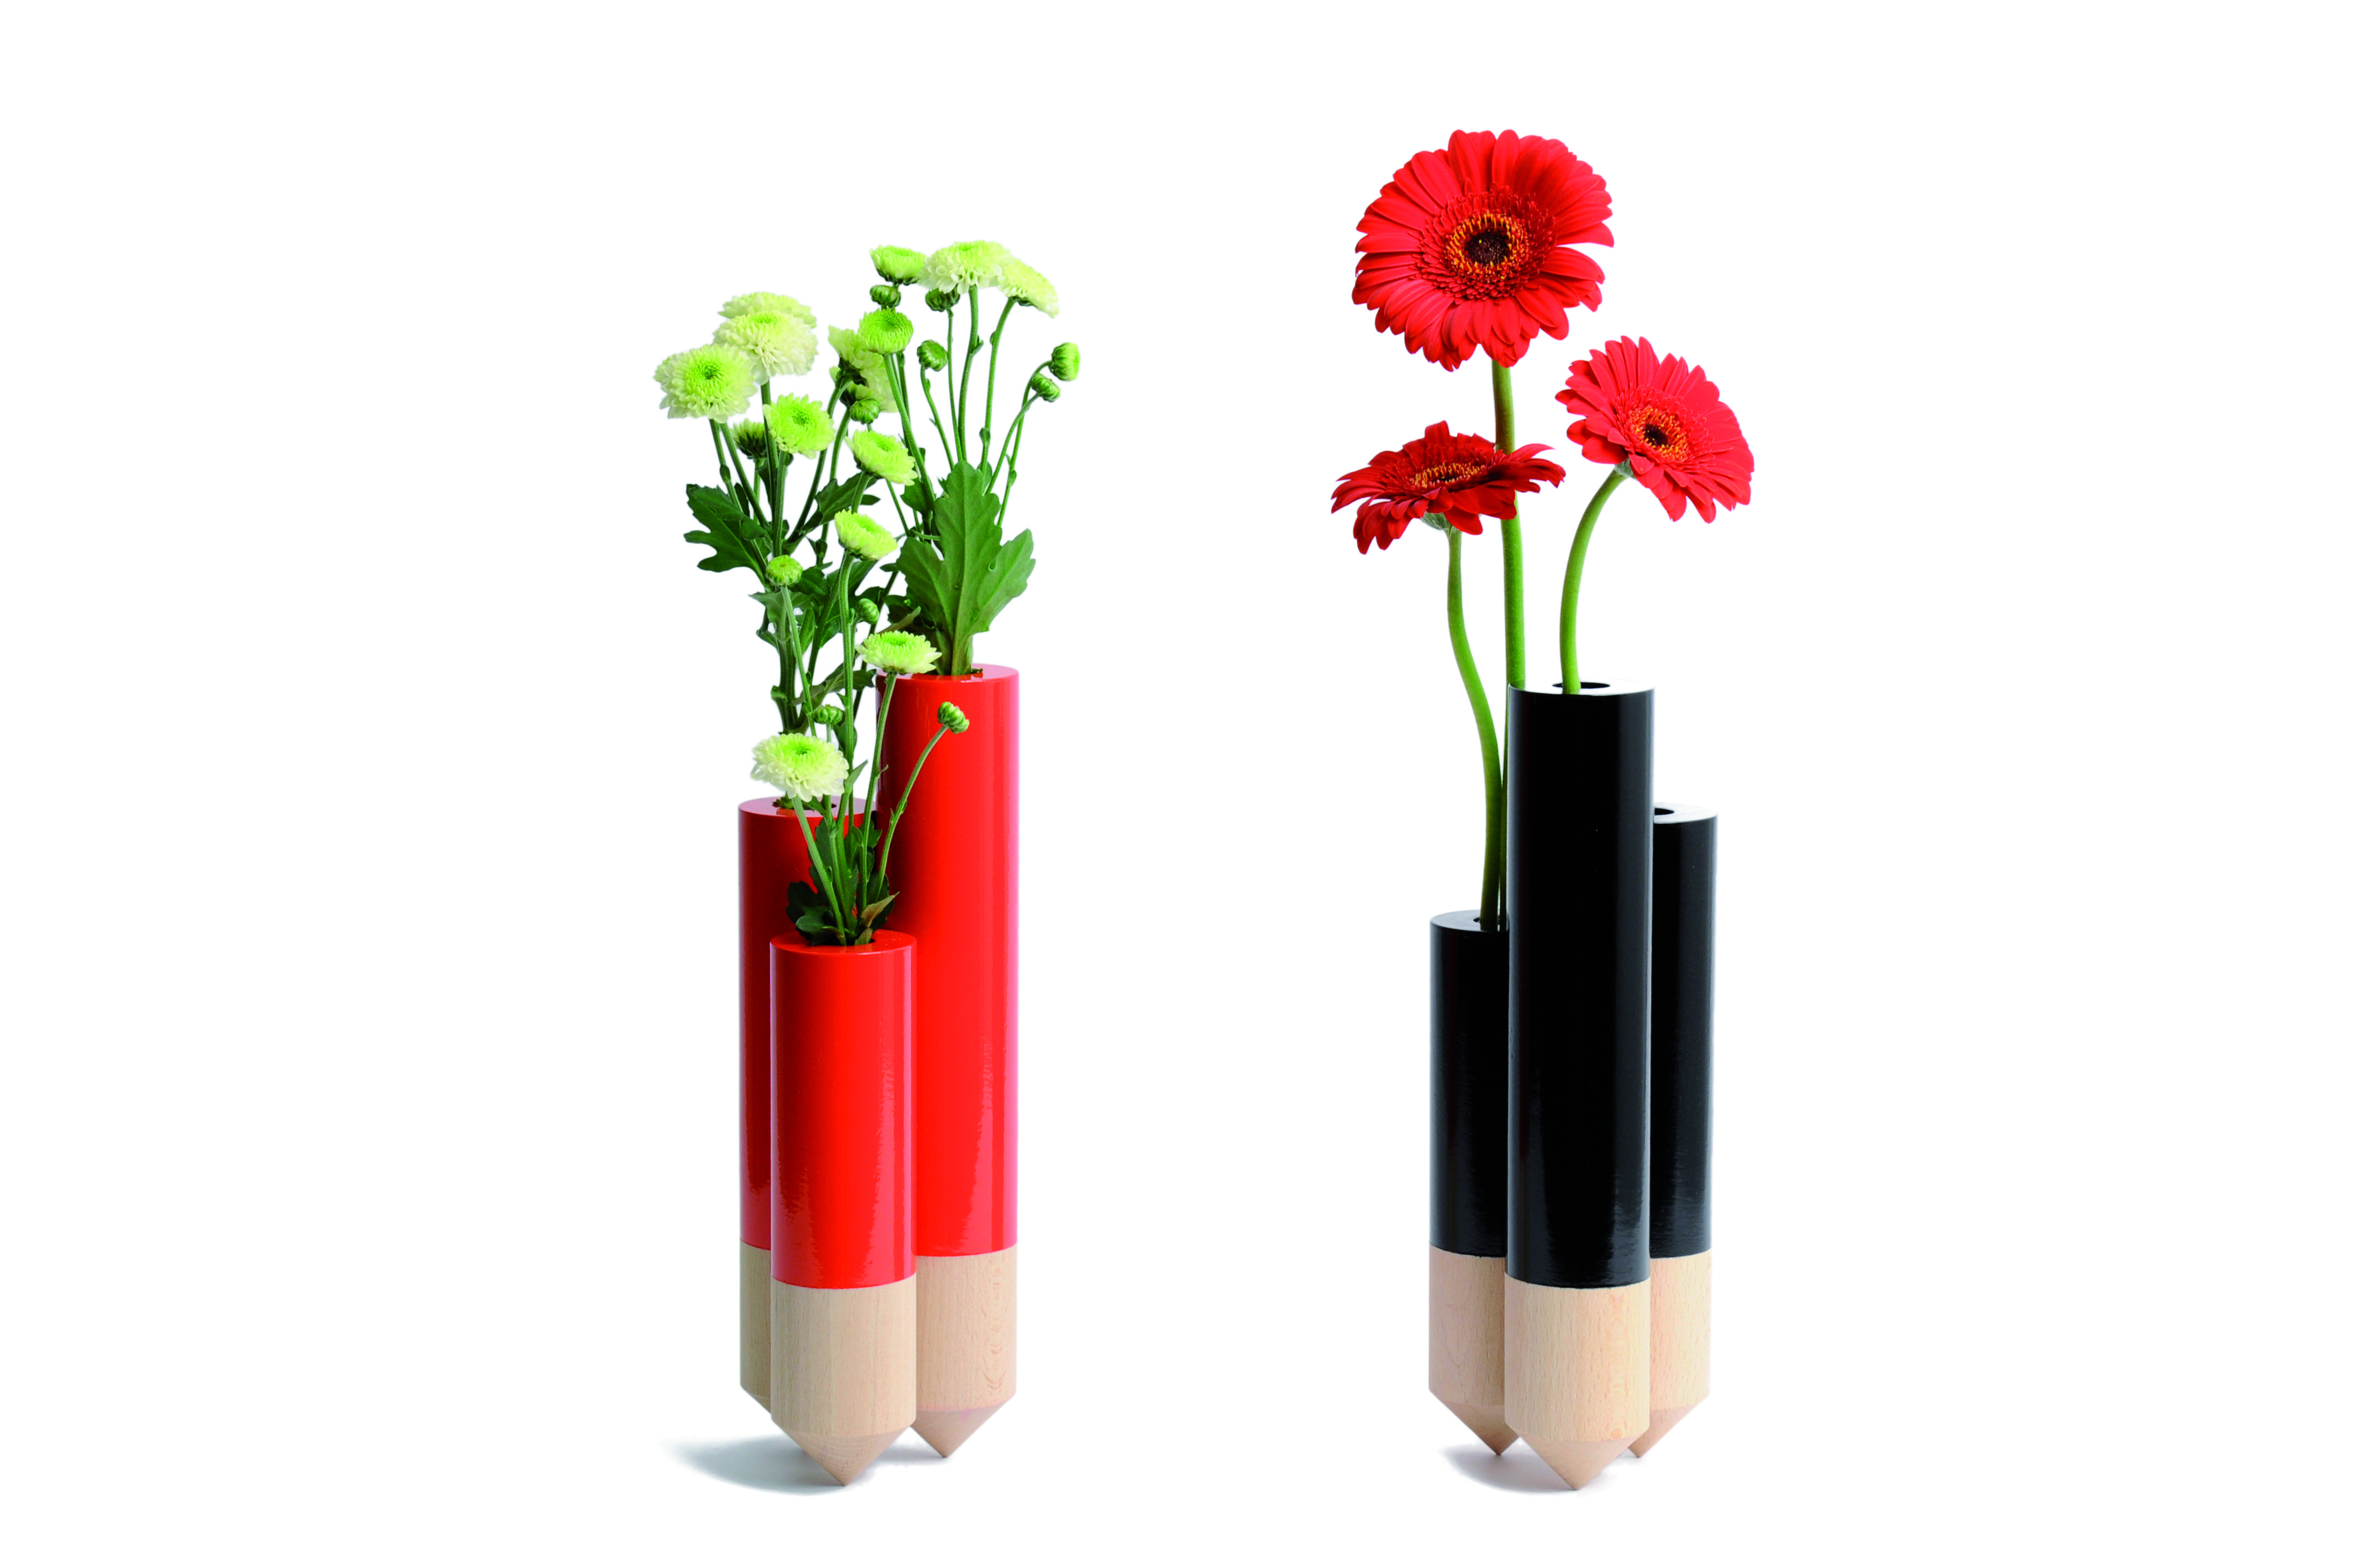 Pik Soliflore by Y'A PAS LE FEU https://goo.gl/sD0AG2 #geniusdesign_international #geniusdesign #gift #Motherday